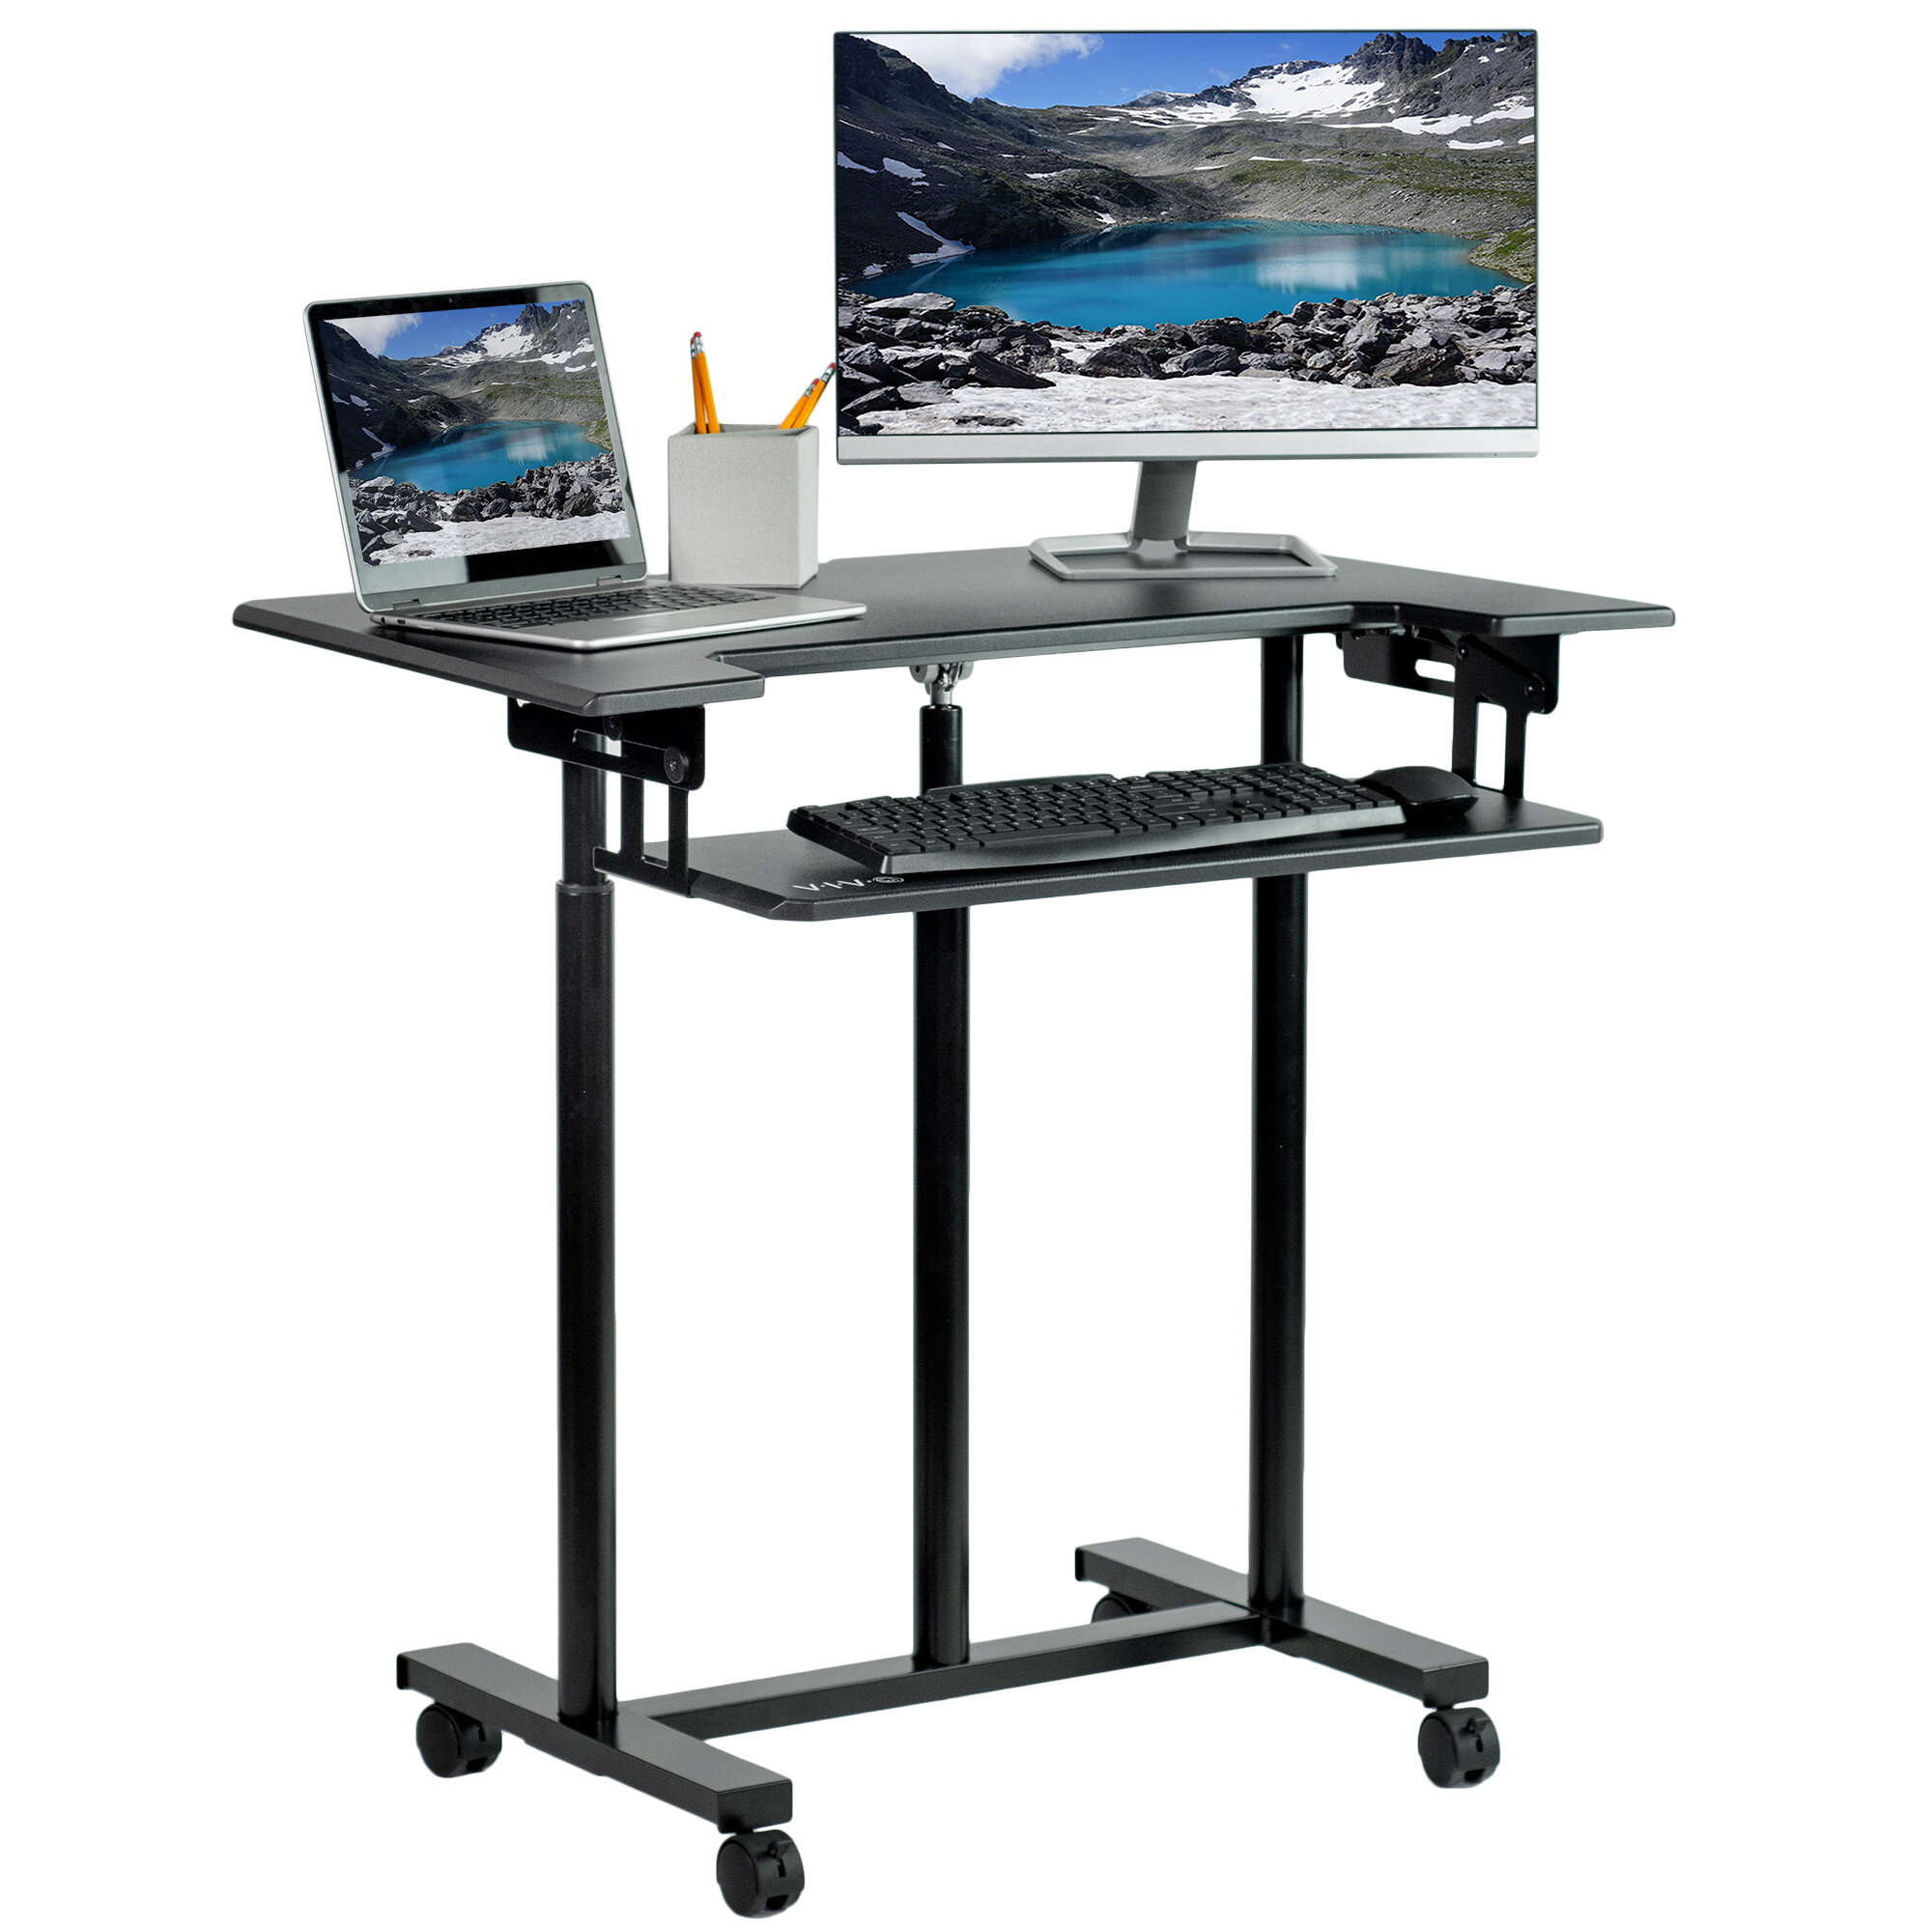 Vivo Mobile Stand Up Desk Adjustable Laptop Cart Reviews Wayfair